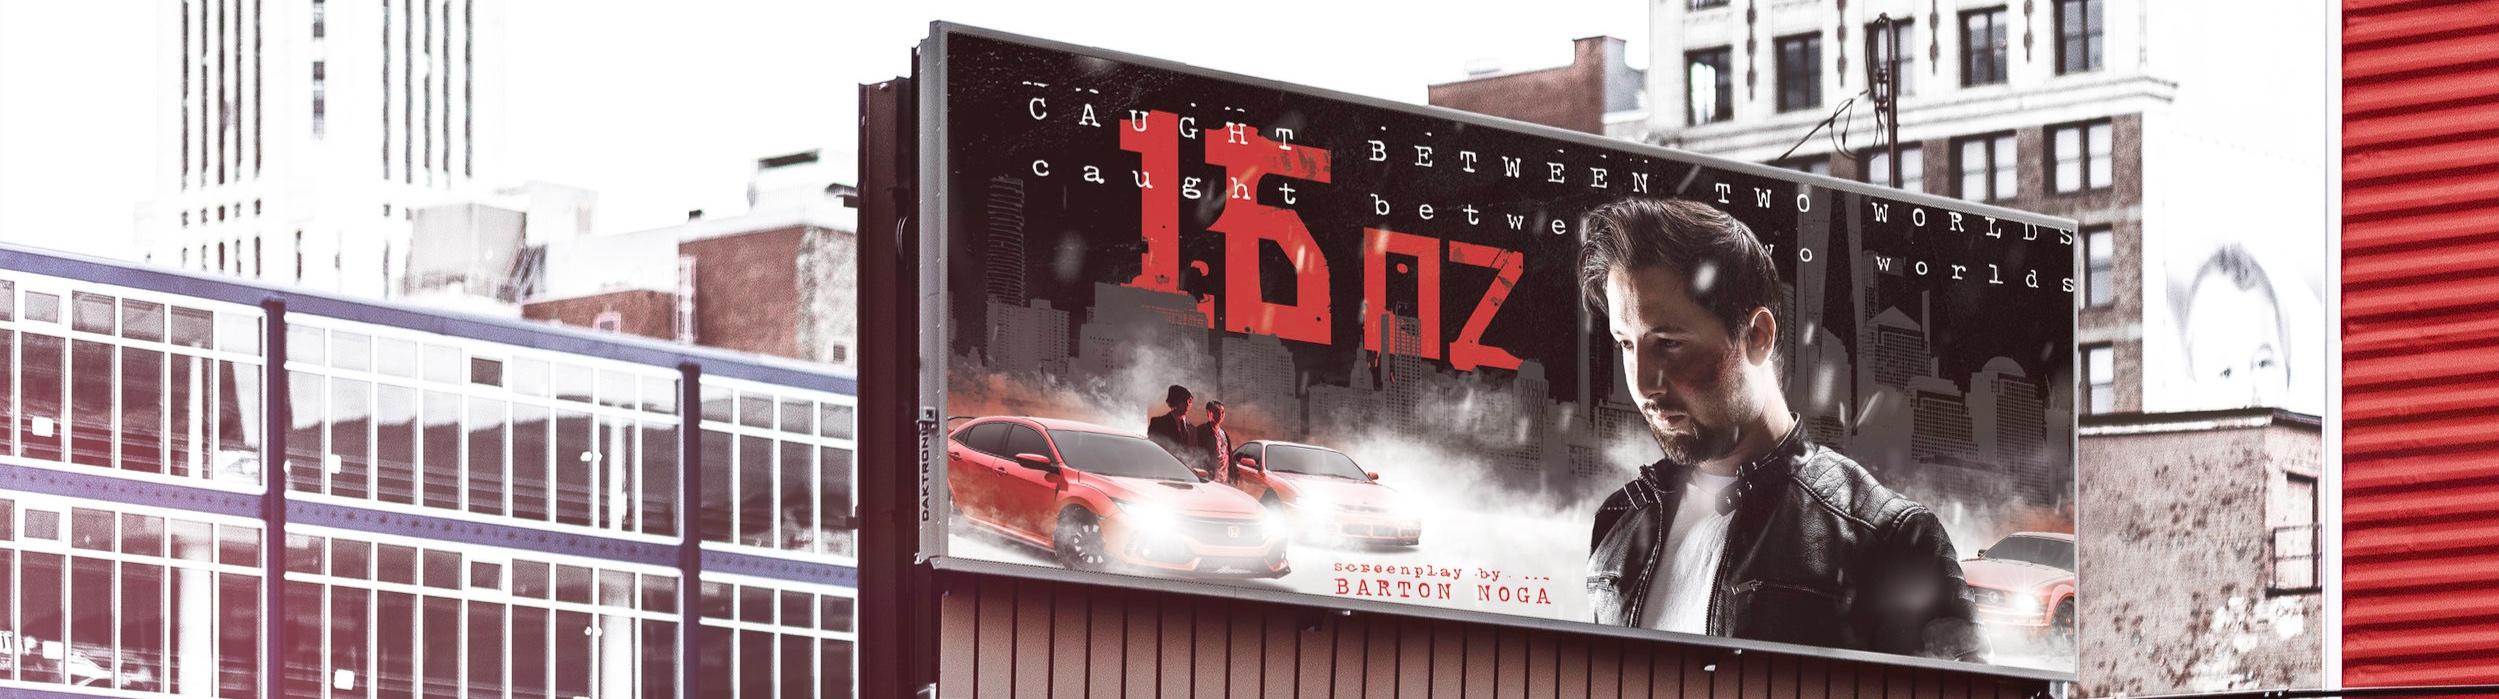 Movie+Promo+Billboard.jpg